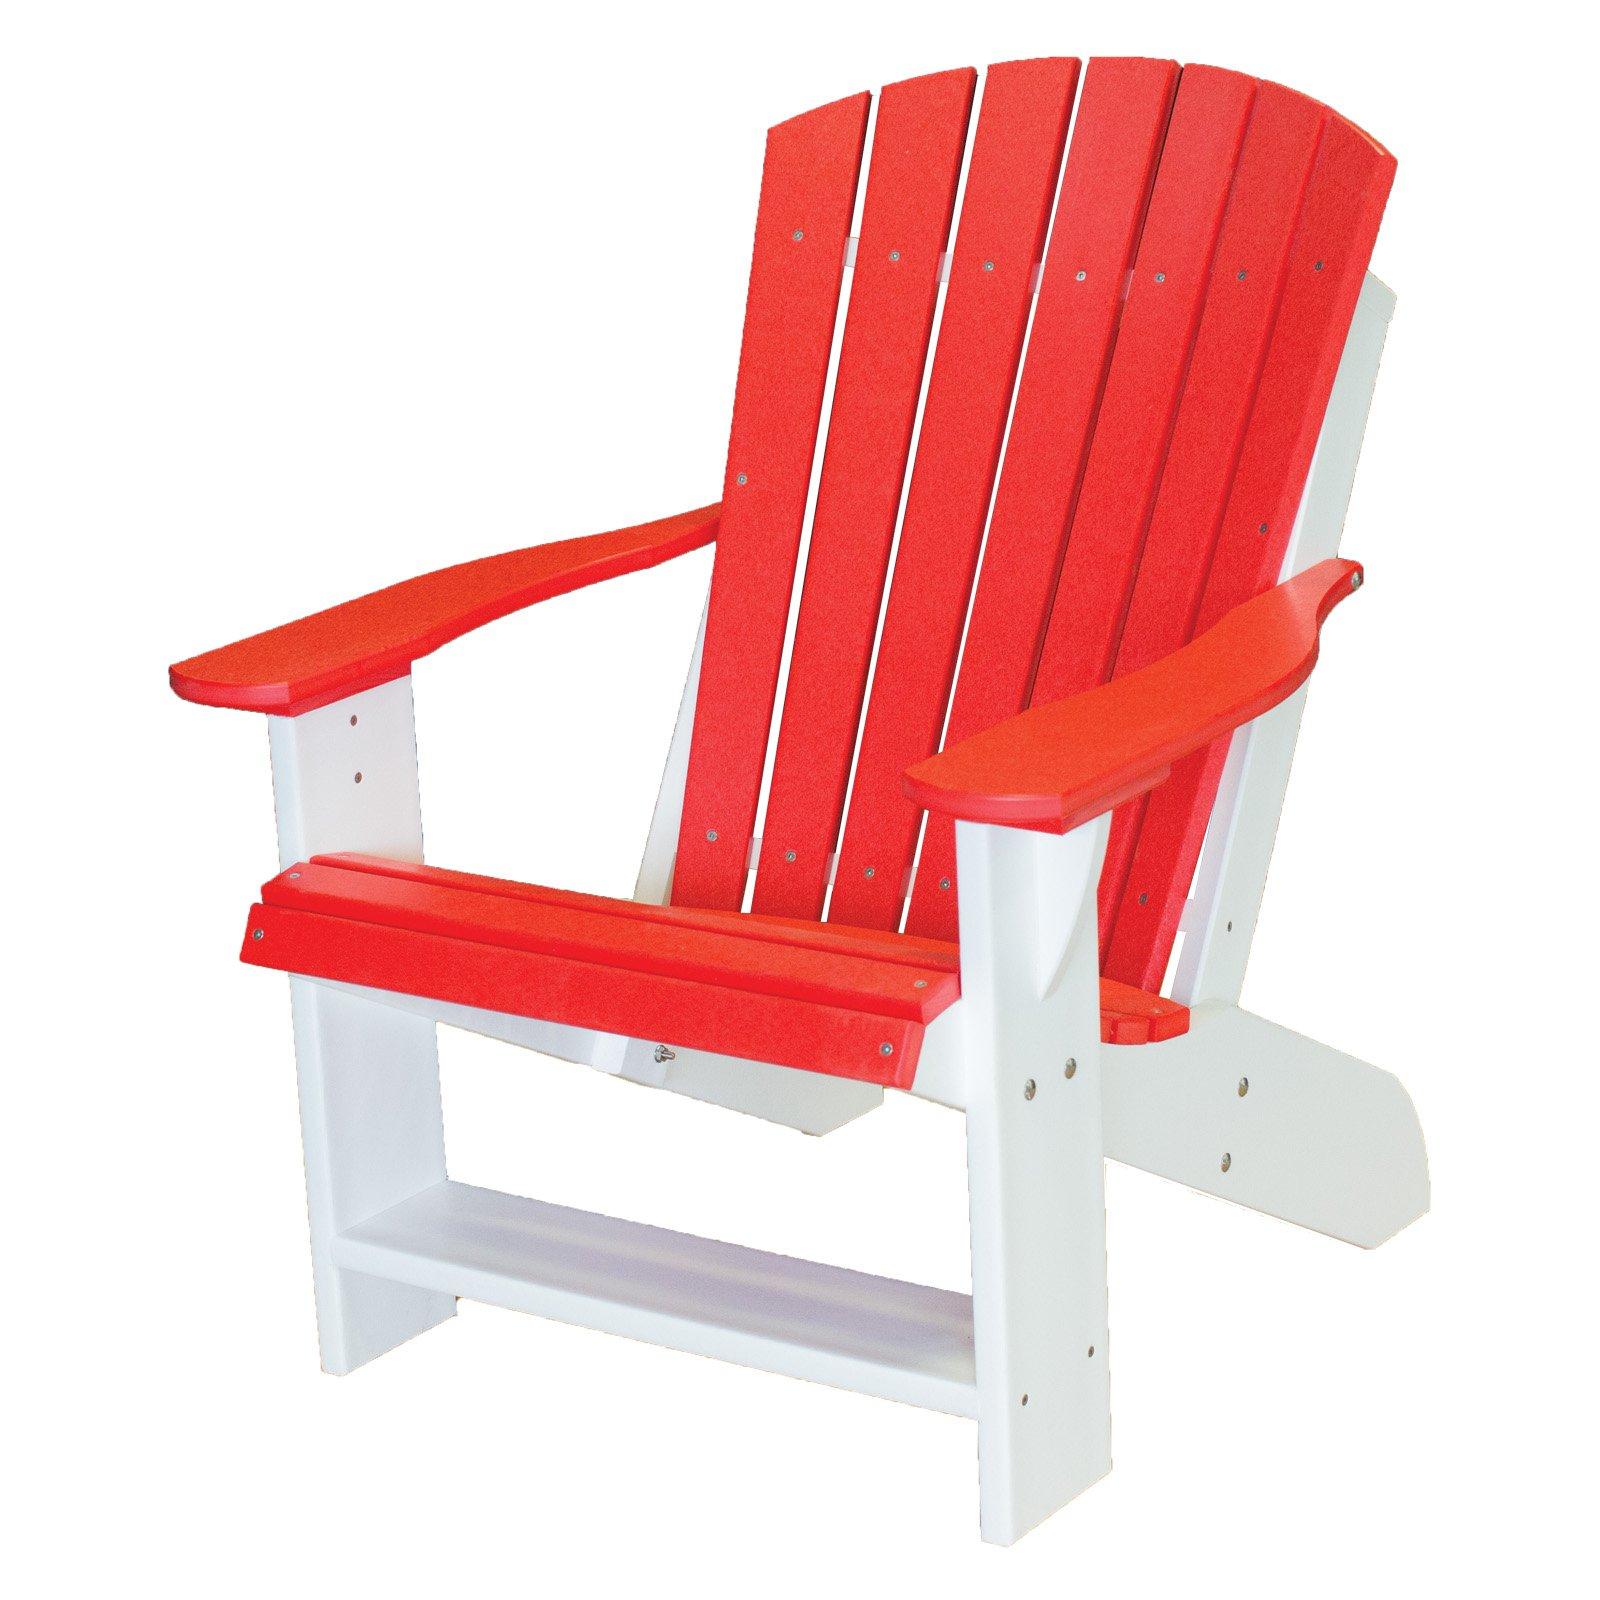 WILDRIDGE Wildridge Two-Tone Recycled Plastic Adirondack Chair